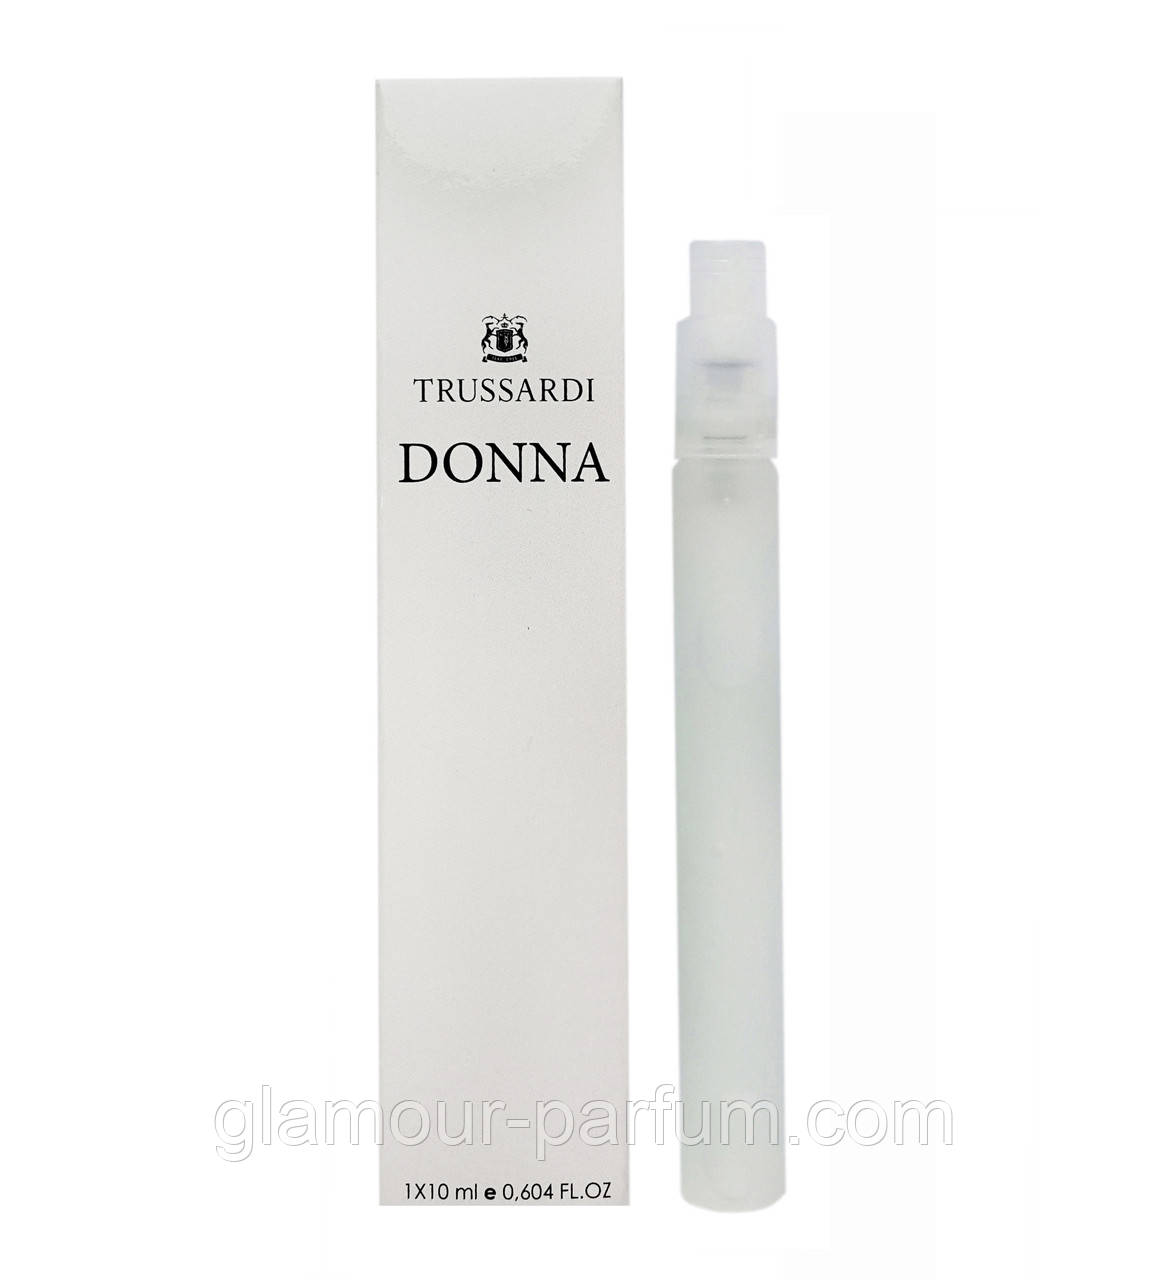 Мини парфюм Trussardi Donna Trussardi 2011 (Труссарди Донна Труссарди 2011) 10 мл (реплика) ОПТ